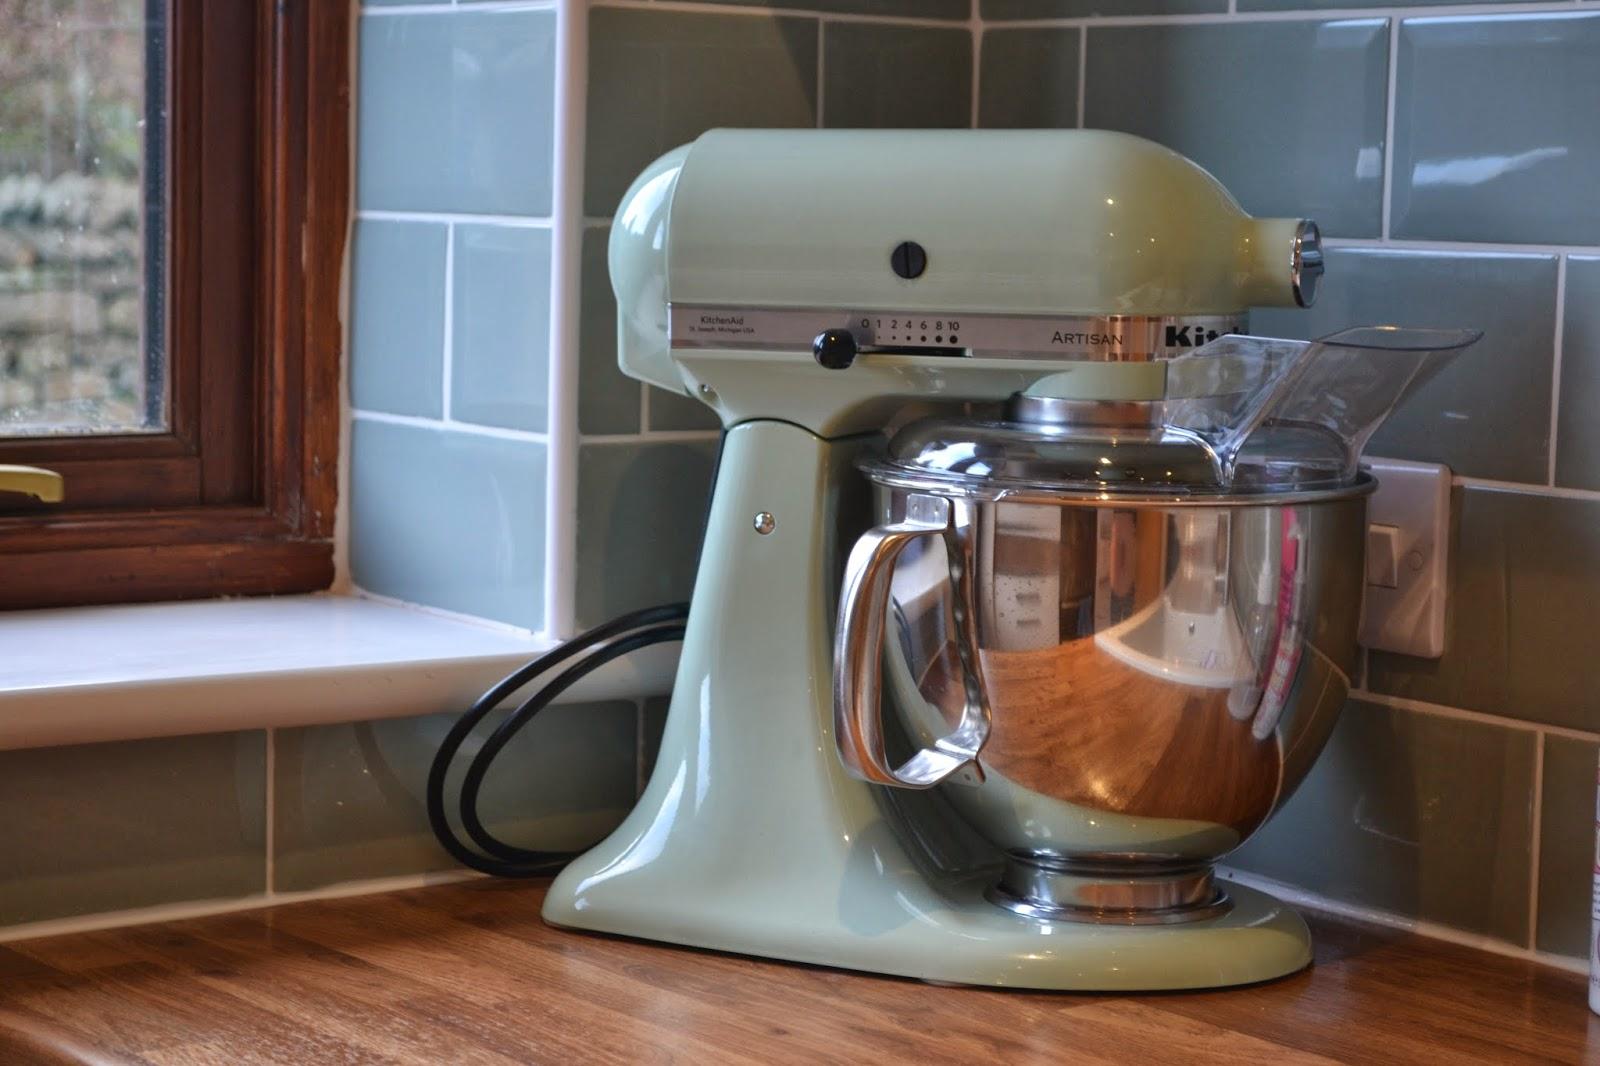 Kitcen Units And Worktop Wickes/Oven, Hob U0026 Hood Zanussi/Artisan Kitchenaid  Mixer In Pistachio/ Kettle U0026 Toaster Morphy Richards/Kilner Jars/Sugar U0026  Tea ...